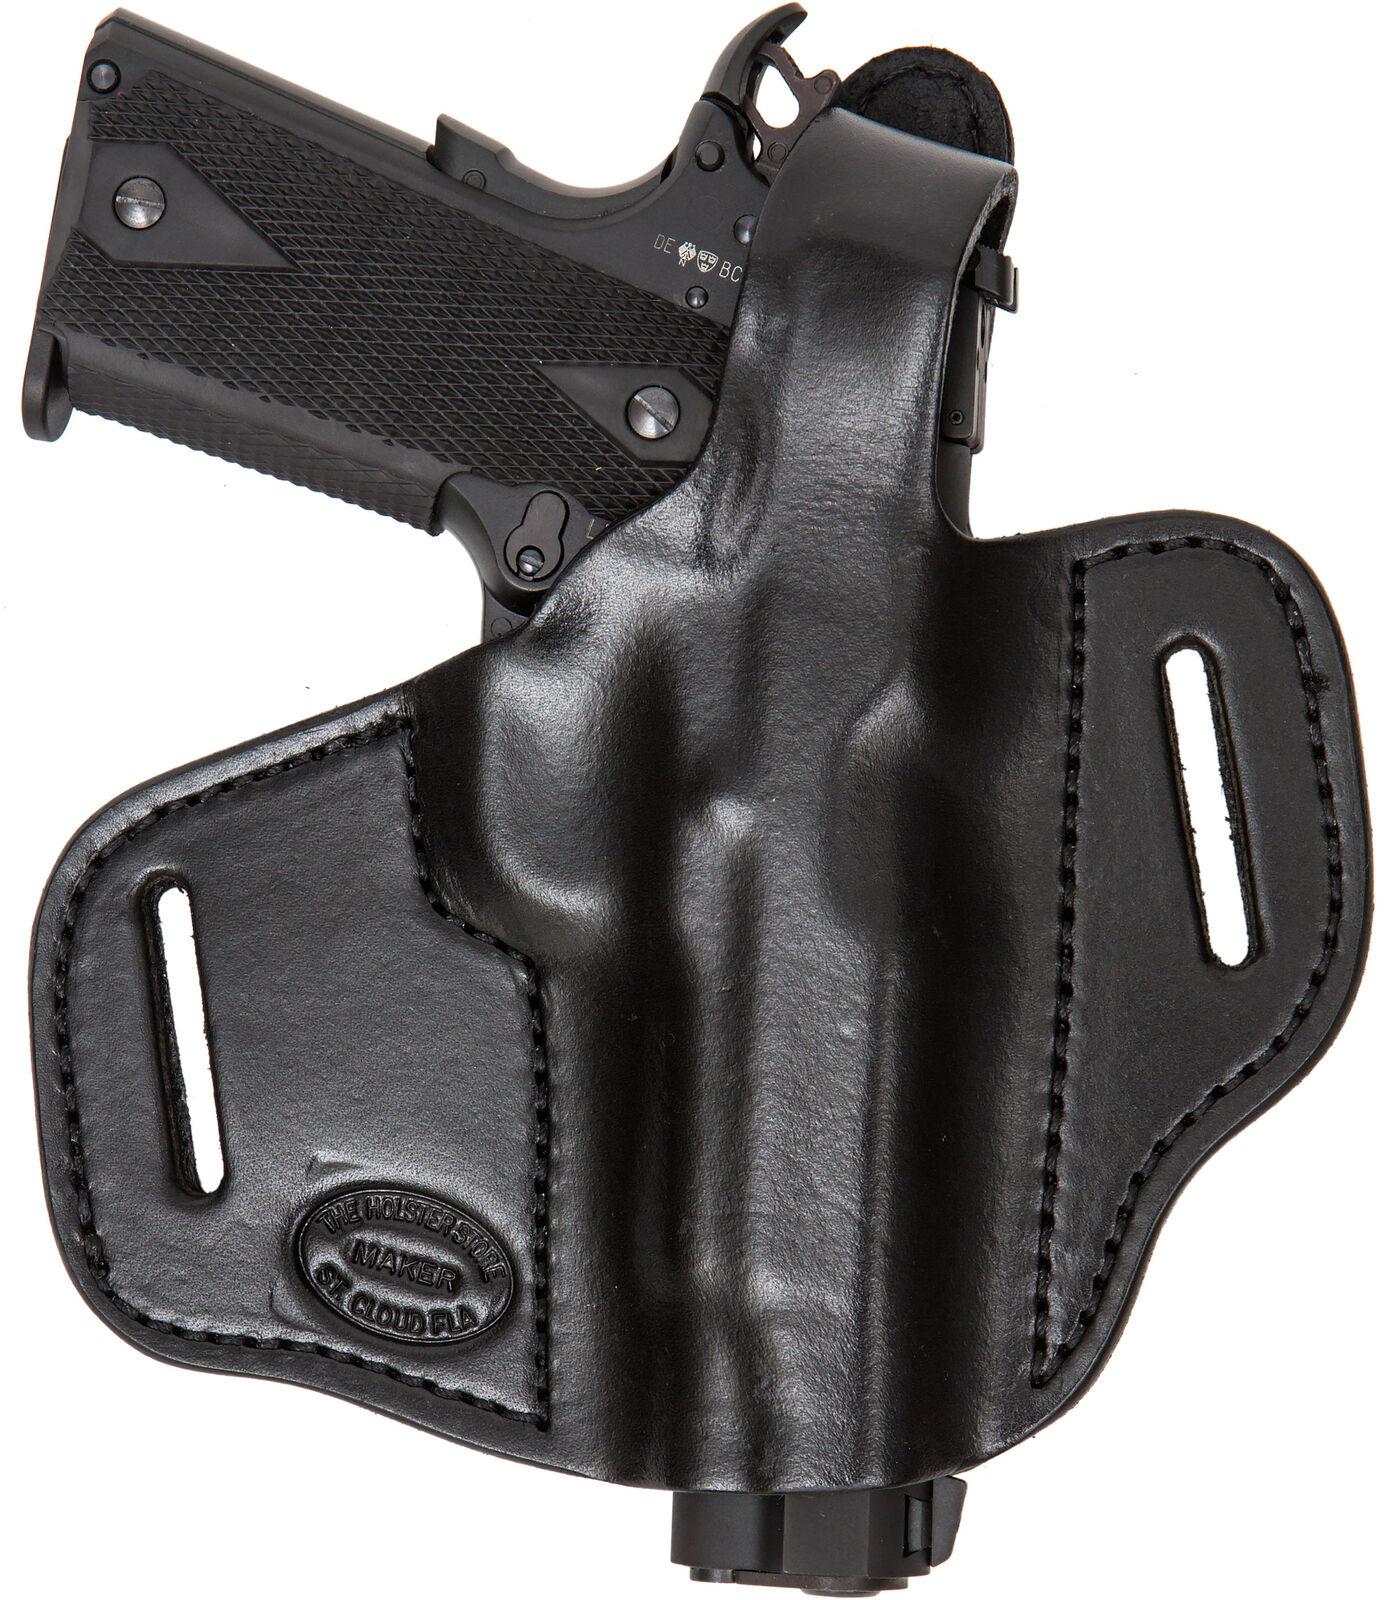 On Duty Conceal RH LH OWB Gun Leder Gun OWB Holster For Citadel 1911 3.5